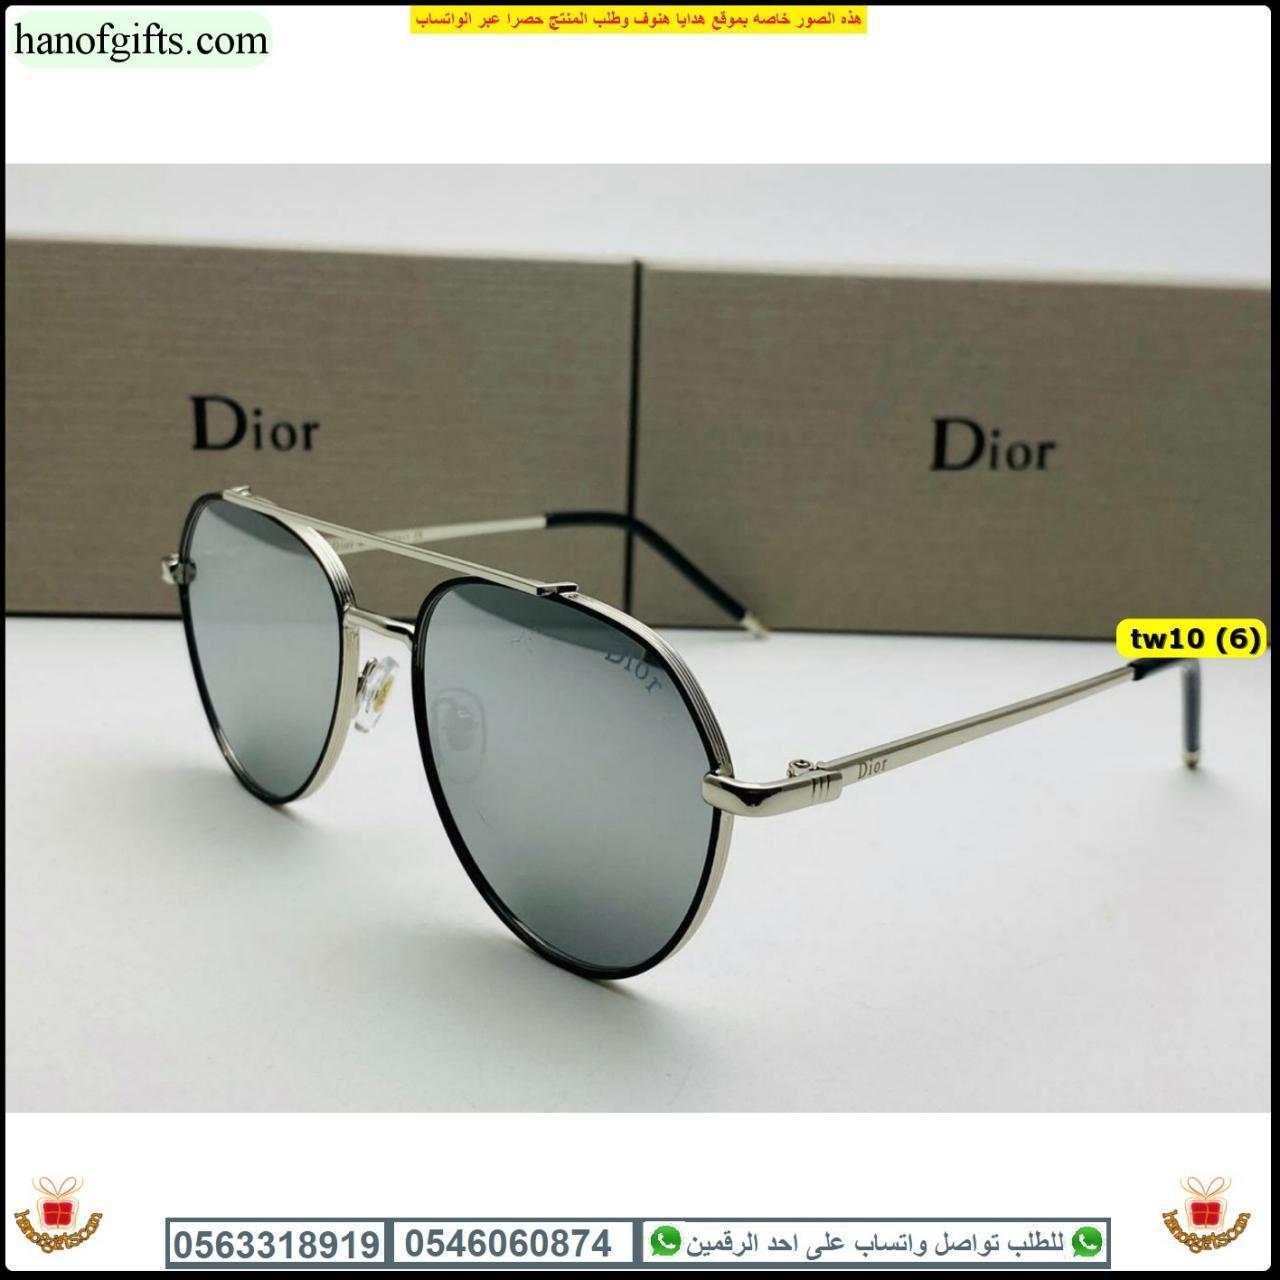 نظارات ديور ٢٠٢٠